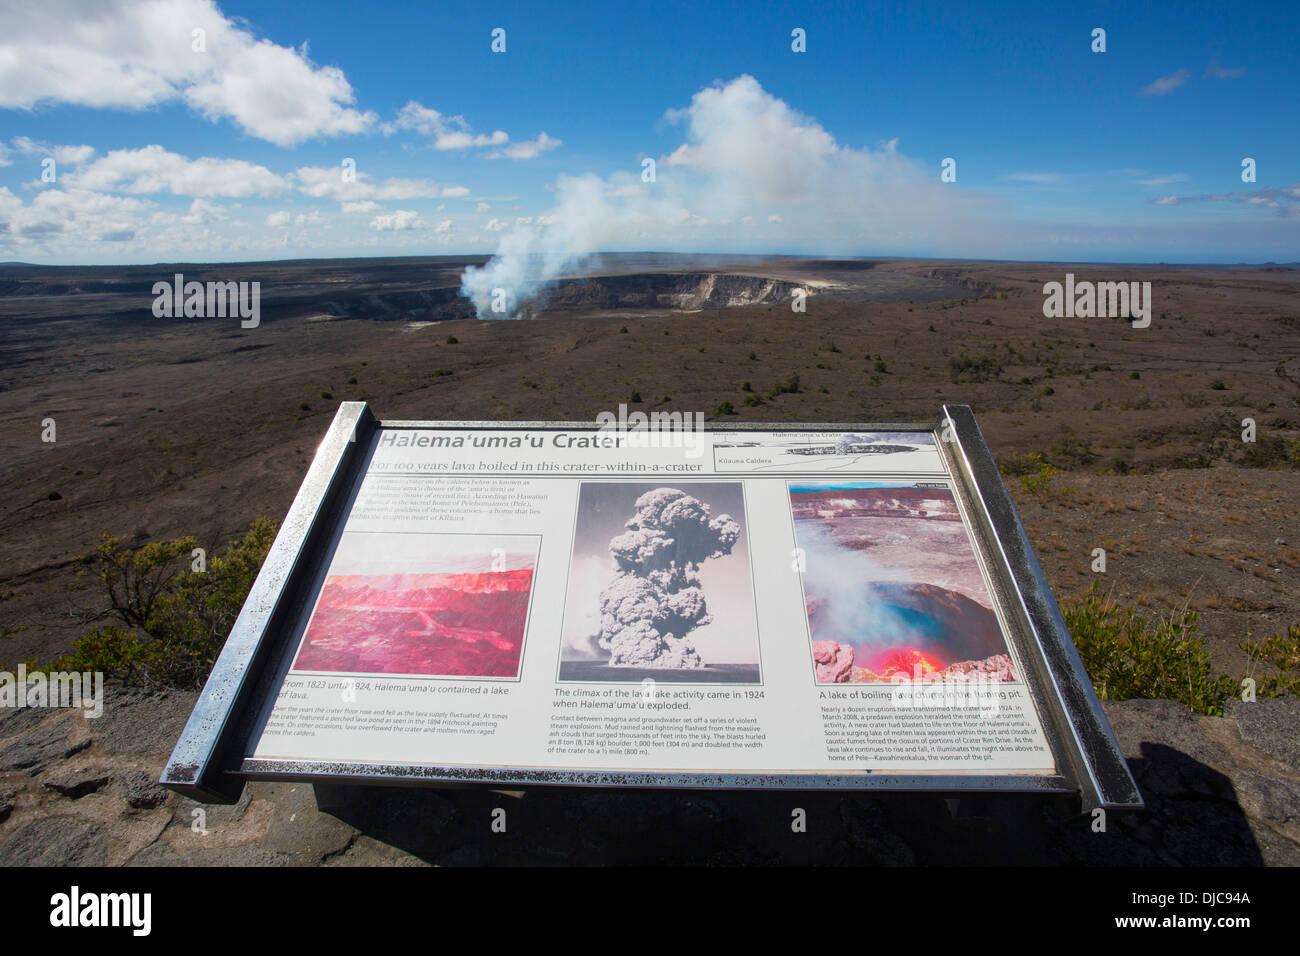 Halemaumau Crater, Kilauea Volcano, HVNP, Big Island of Hawaii - Stock Image